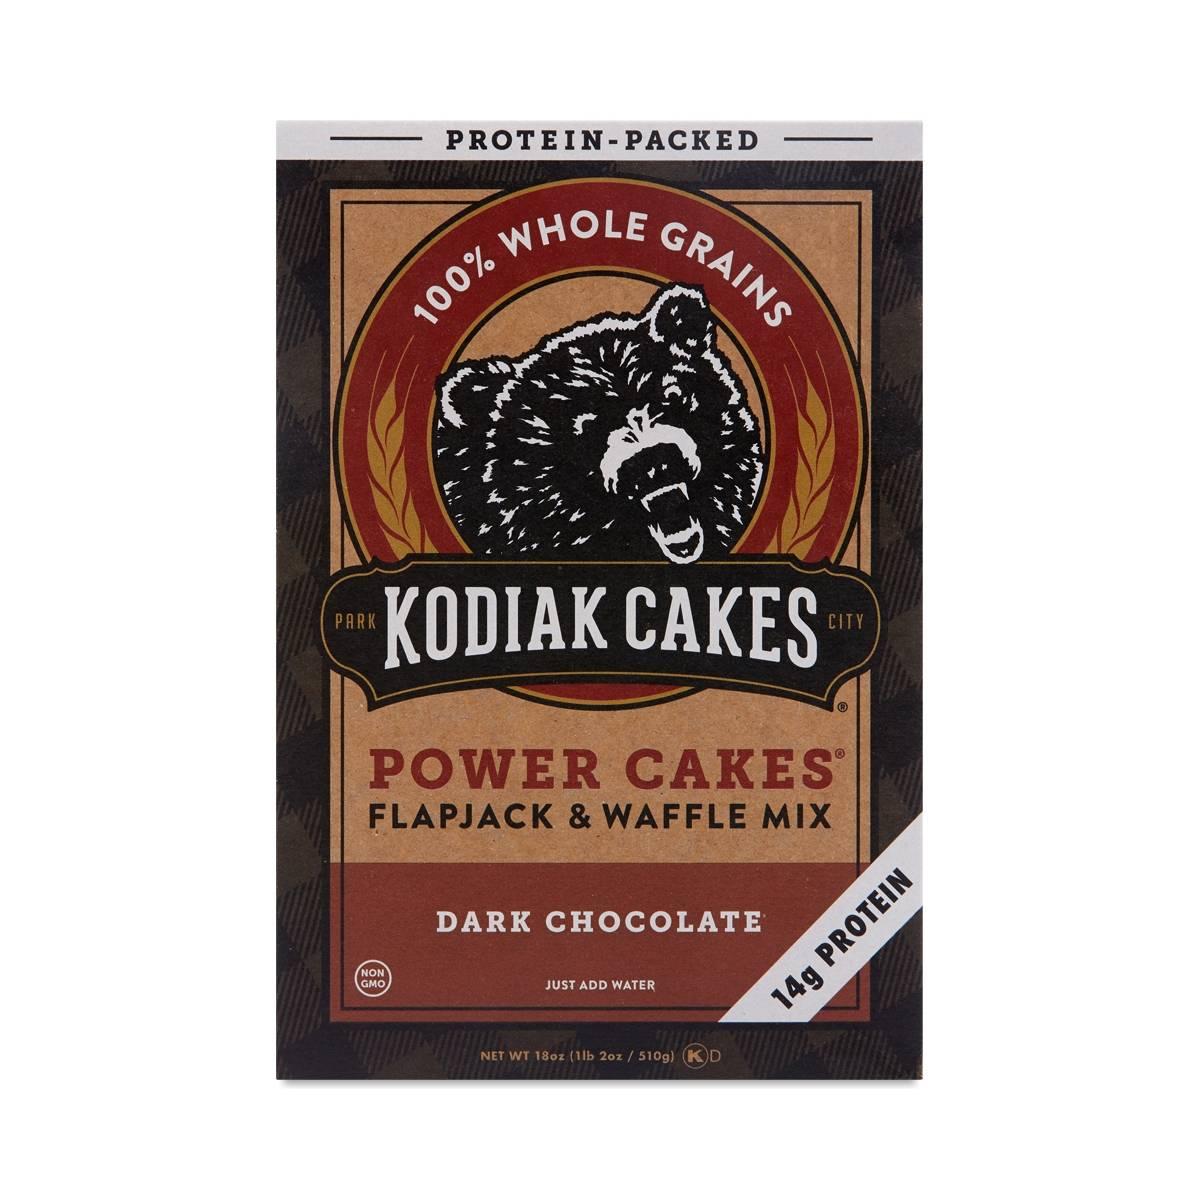 Kodiak Cakes Power Cakes Dark Chocolate Flapjack Amp Waffle